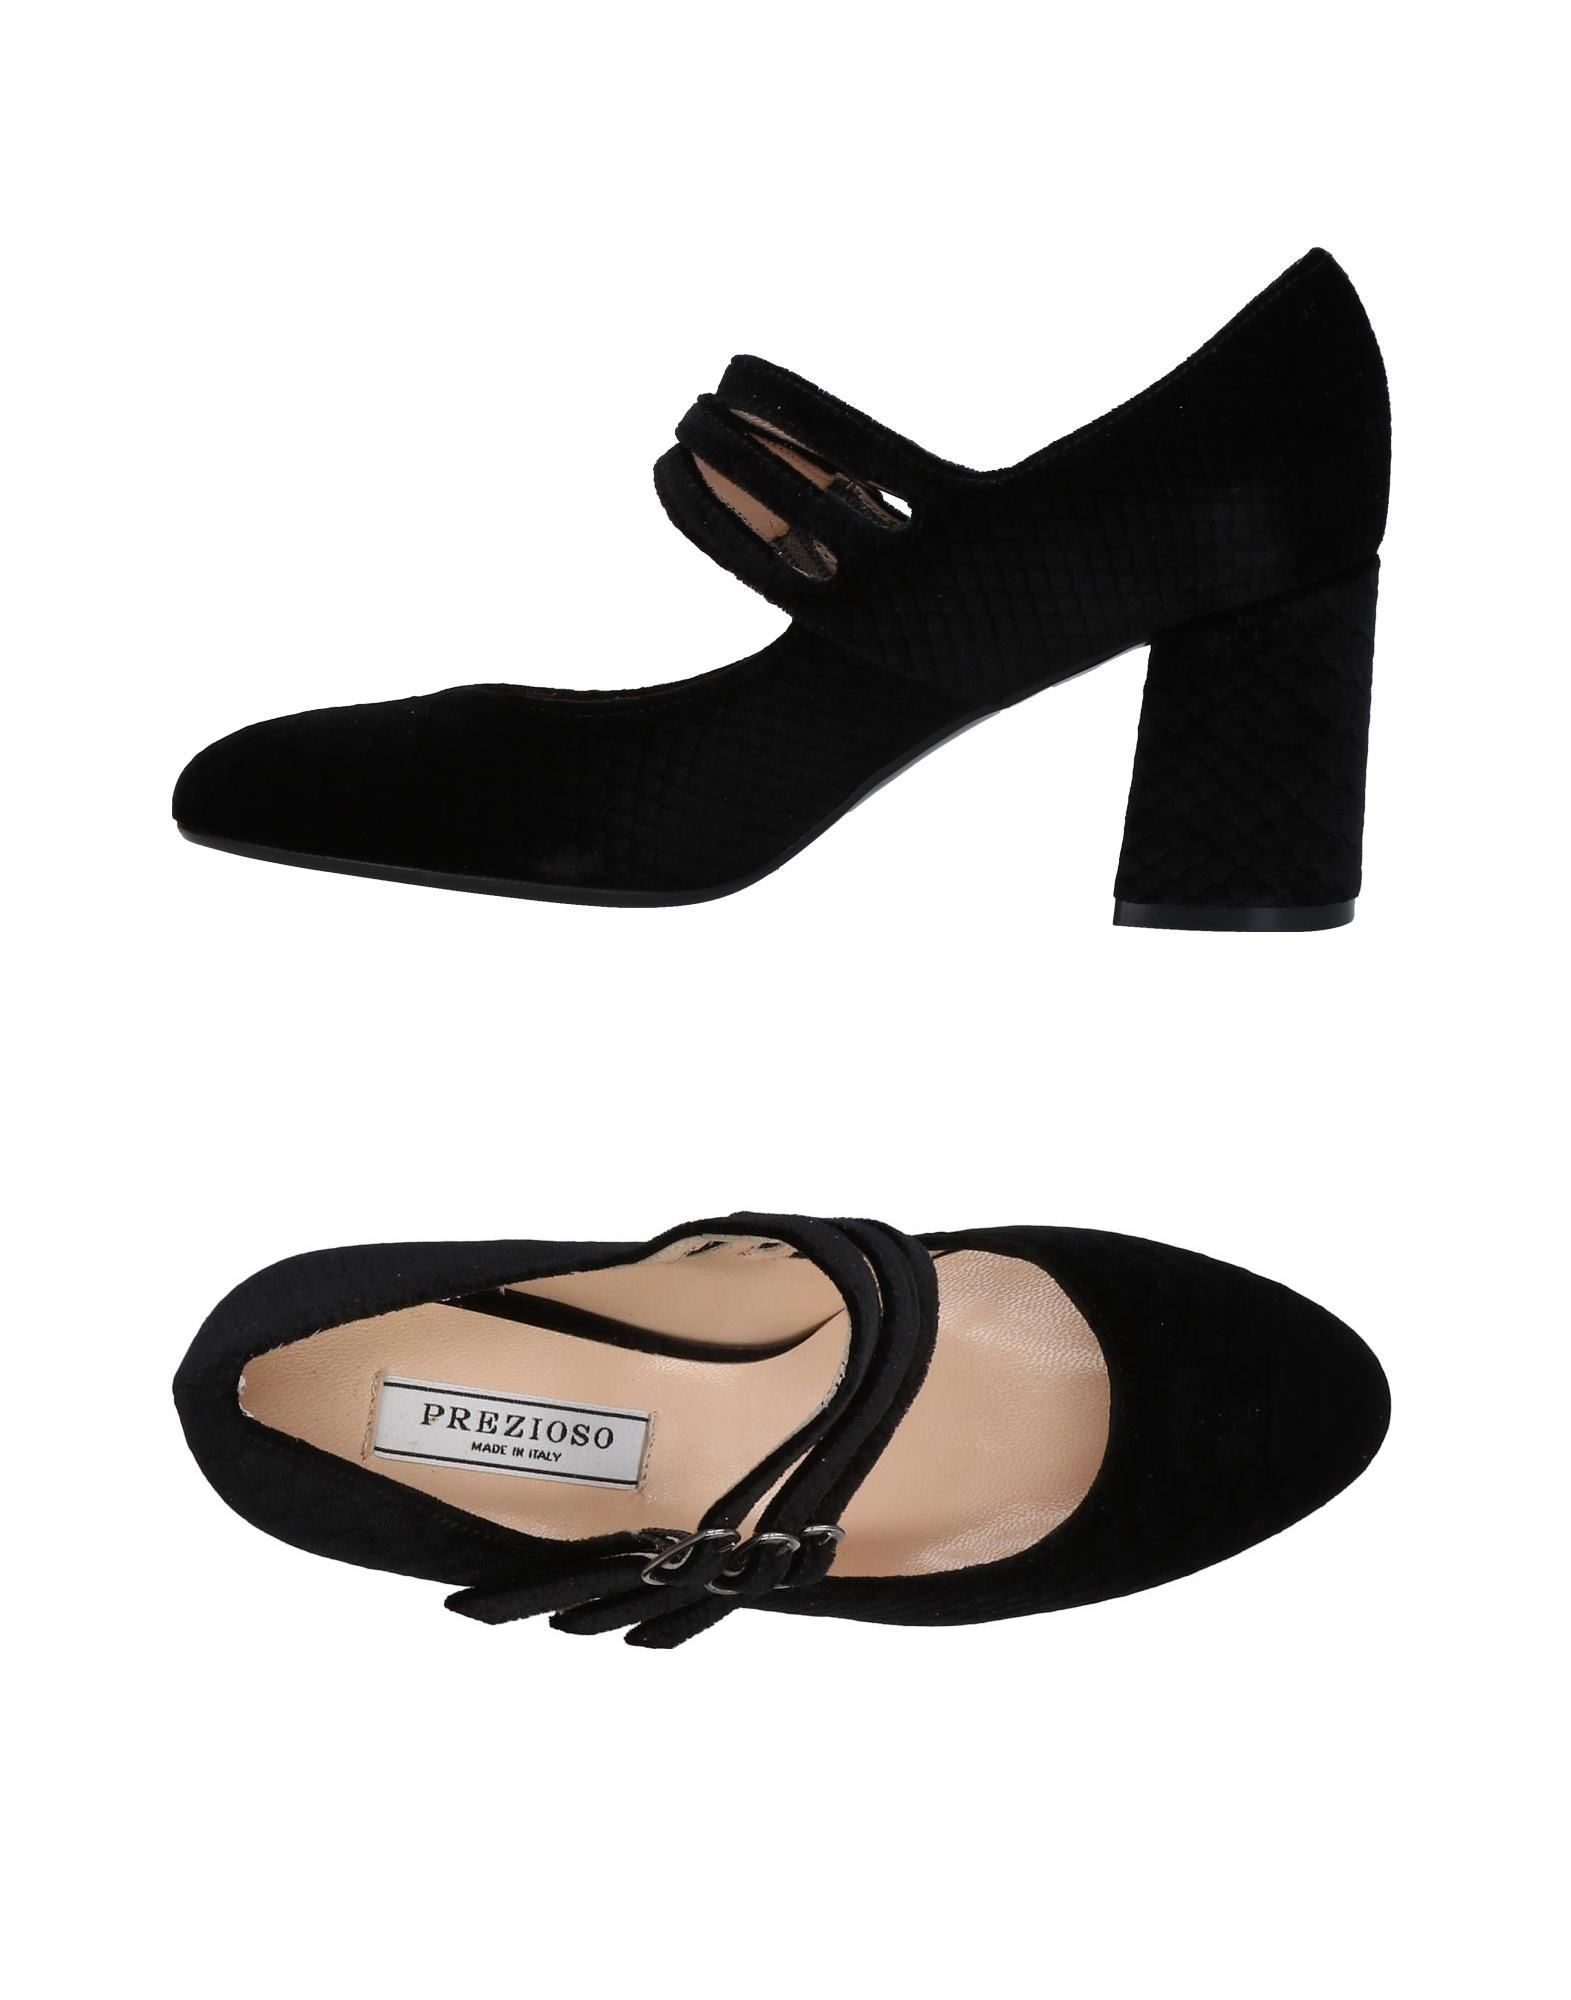 Prezioso Pumps Damen  11449902PA Gute Qualität beliebte Schuhe